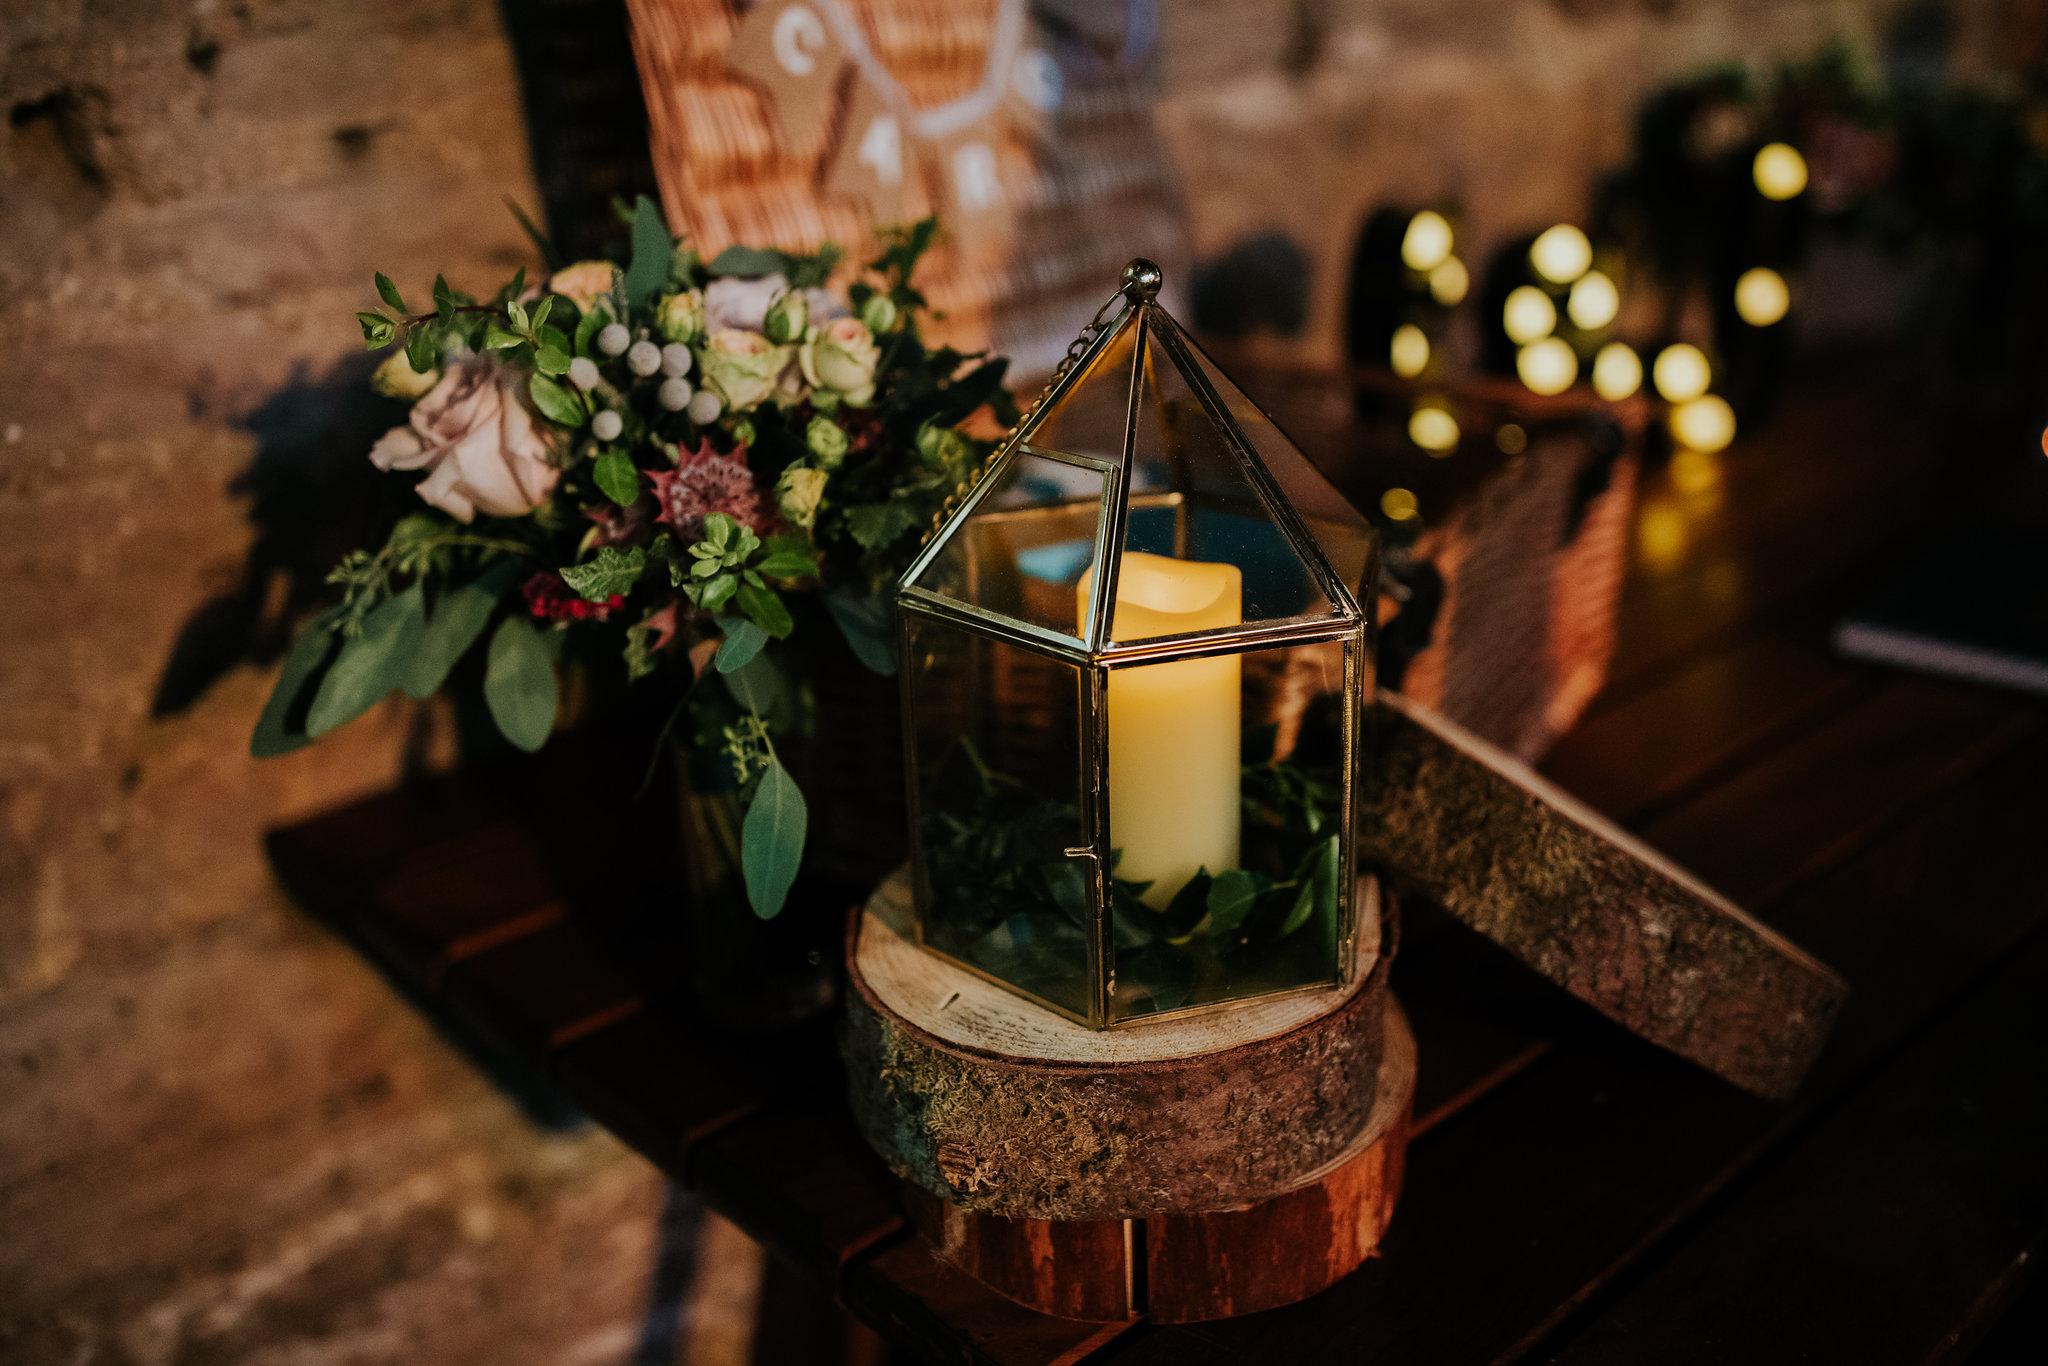 Cottiers wedding lavender and rose wedding florists scotland23.jpg